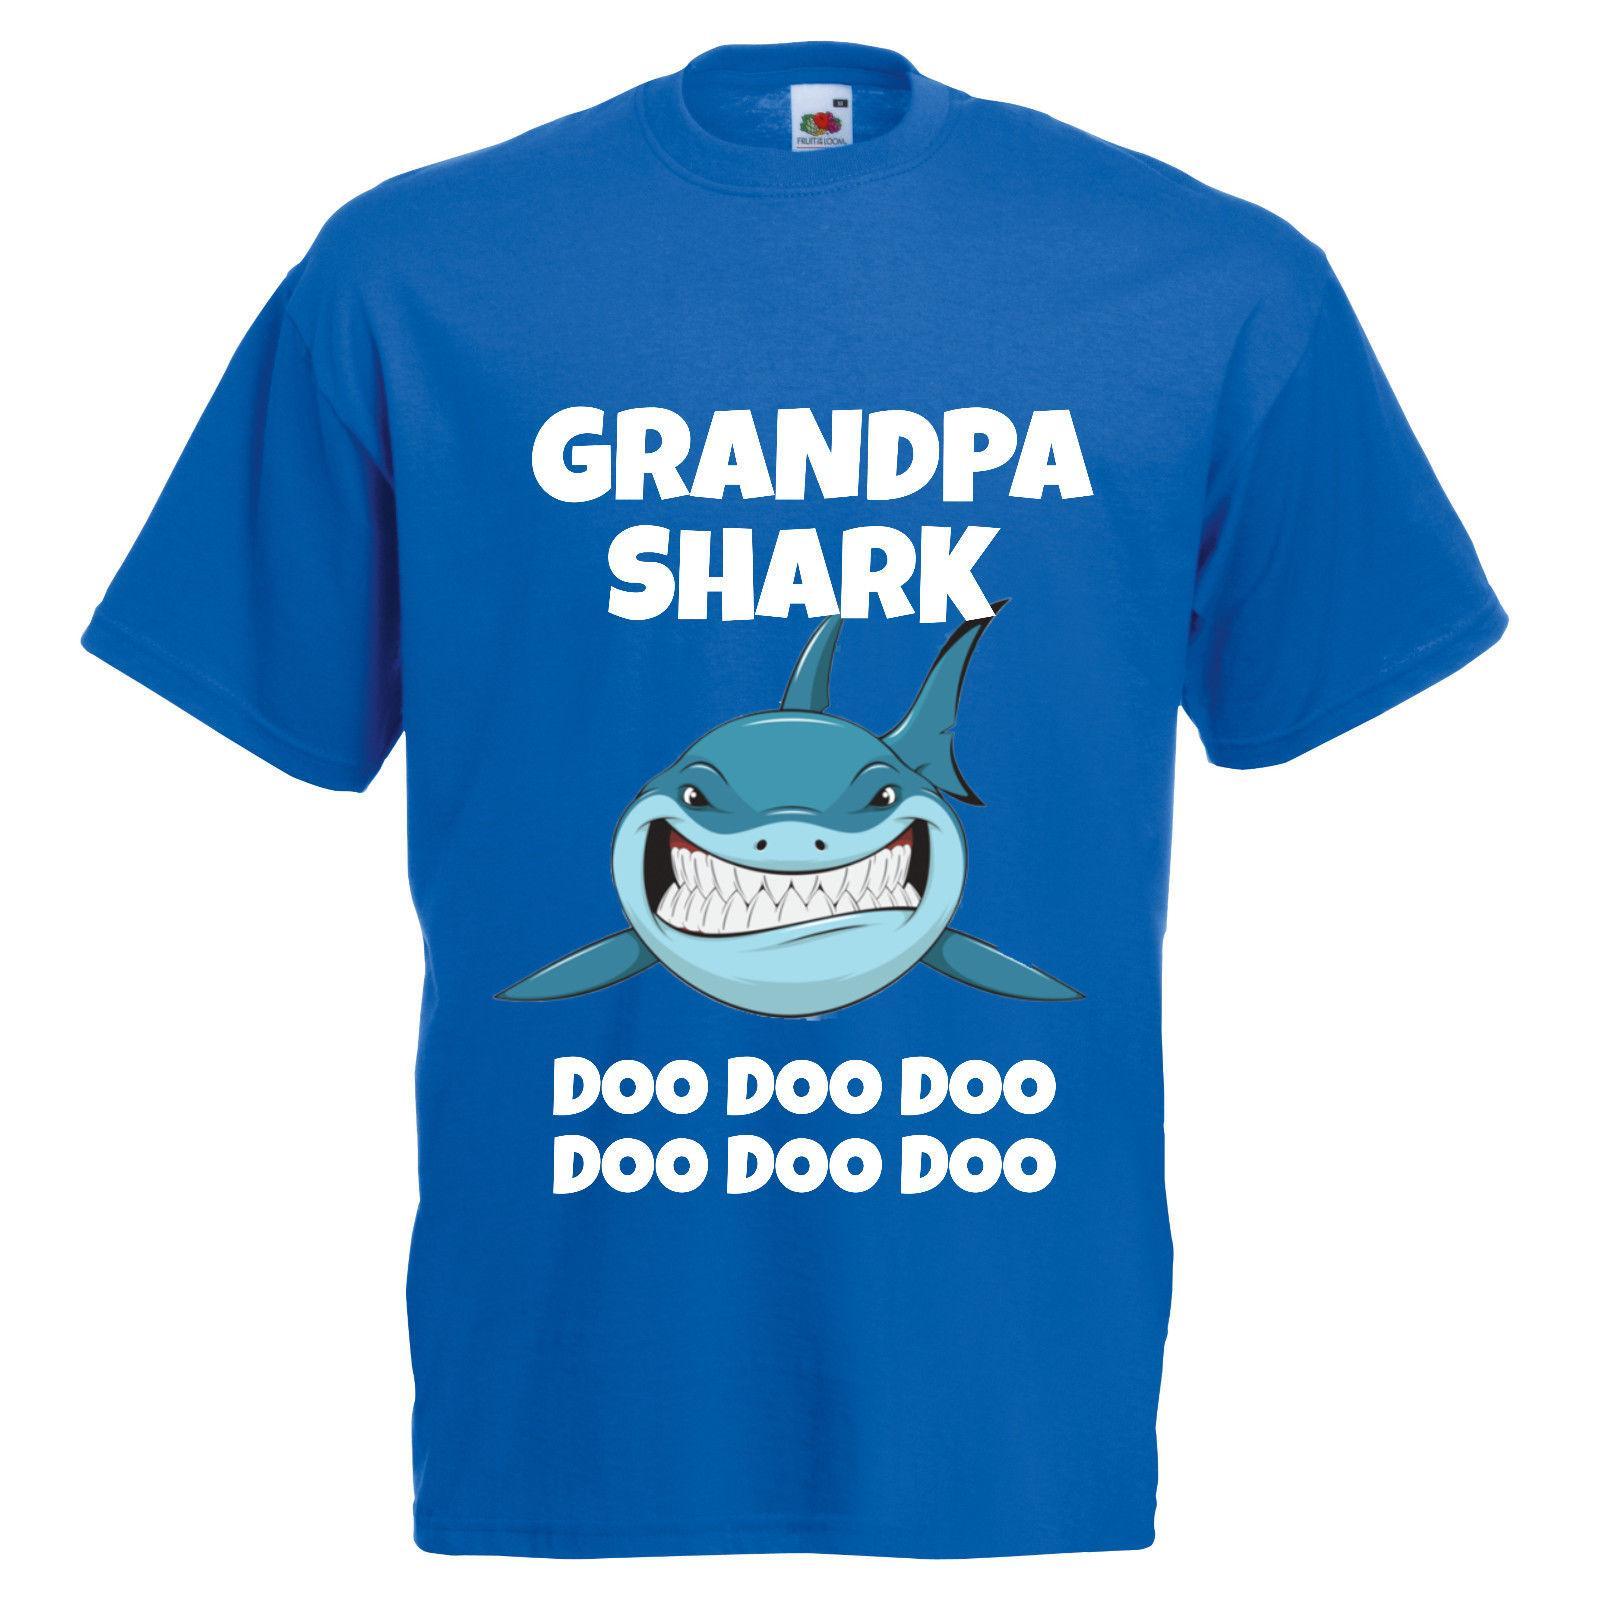 4ffe350b GRANDPA SHARK BABY SHARK T SHIRT DOO DOO DOO VIRAL SONG GIFT T Shirts  Design Designer T Shirts From Young_ten, $12.96| DHgate.Com